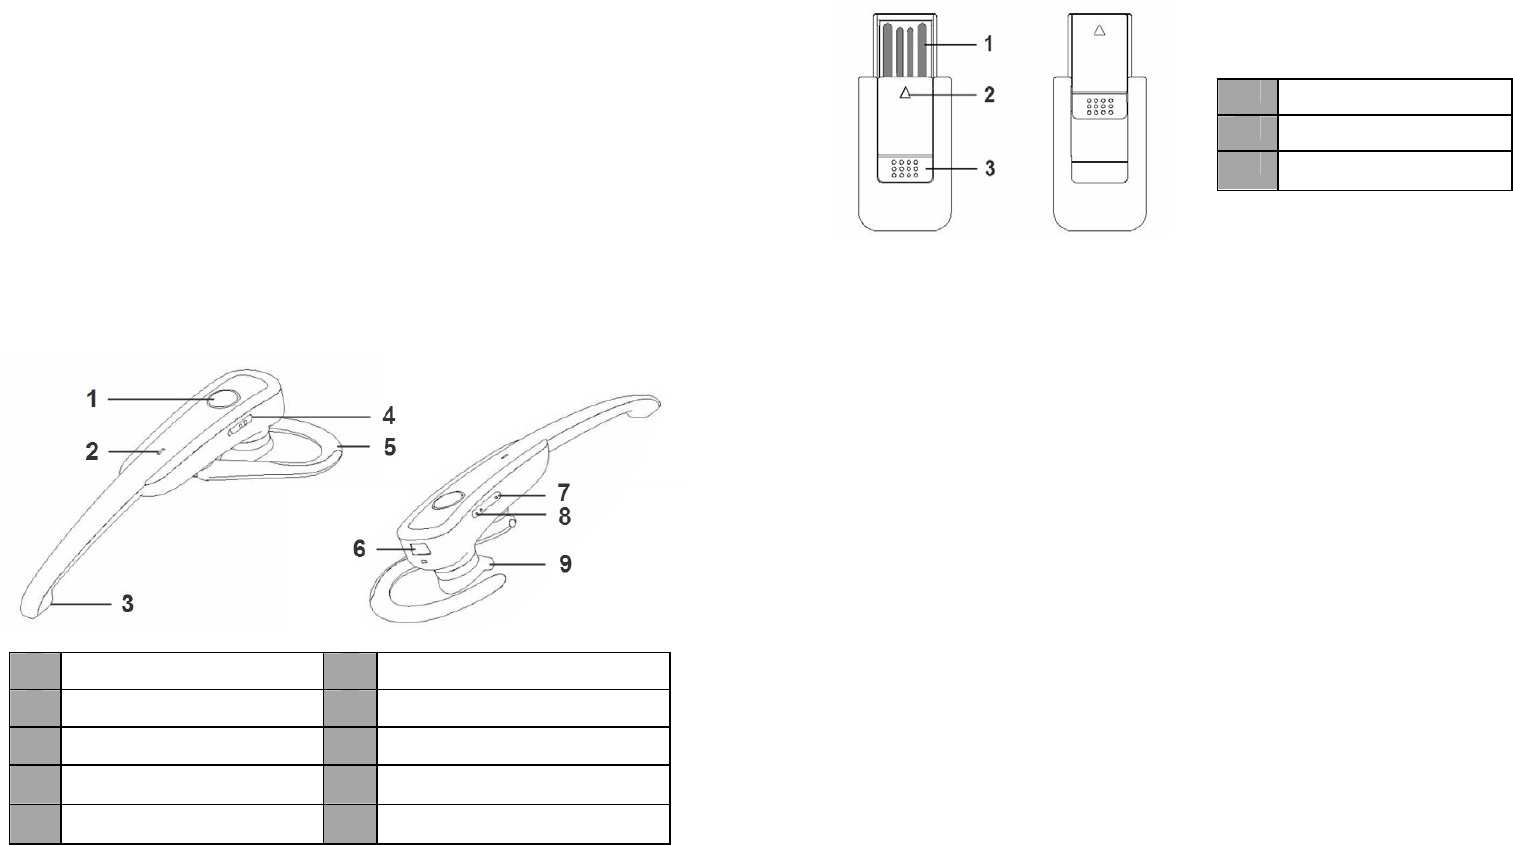 Globalshop BTE0038 Bluetooth Headset User Manual BTE038